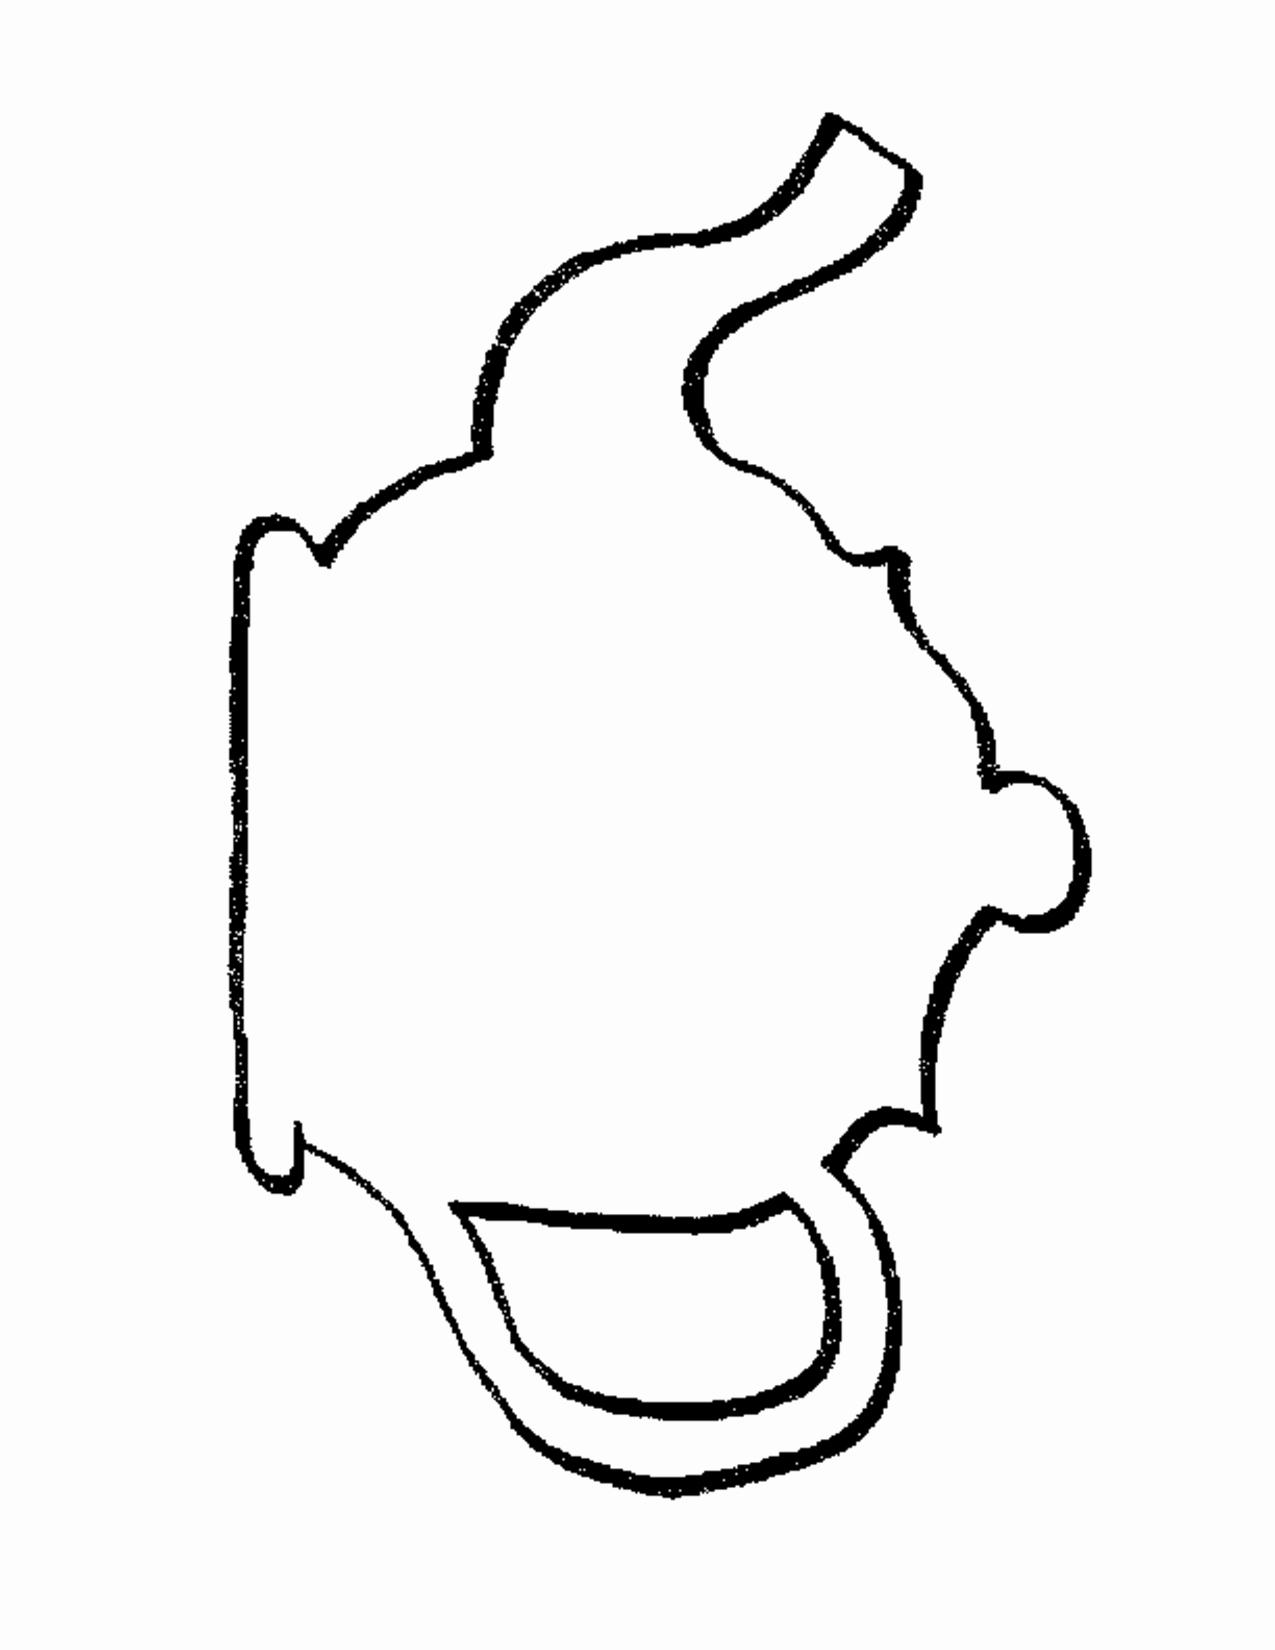 Teapot Template Free Printable Fresh Printable Teapot Cut Out – Ezzy